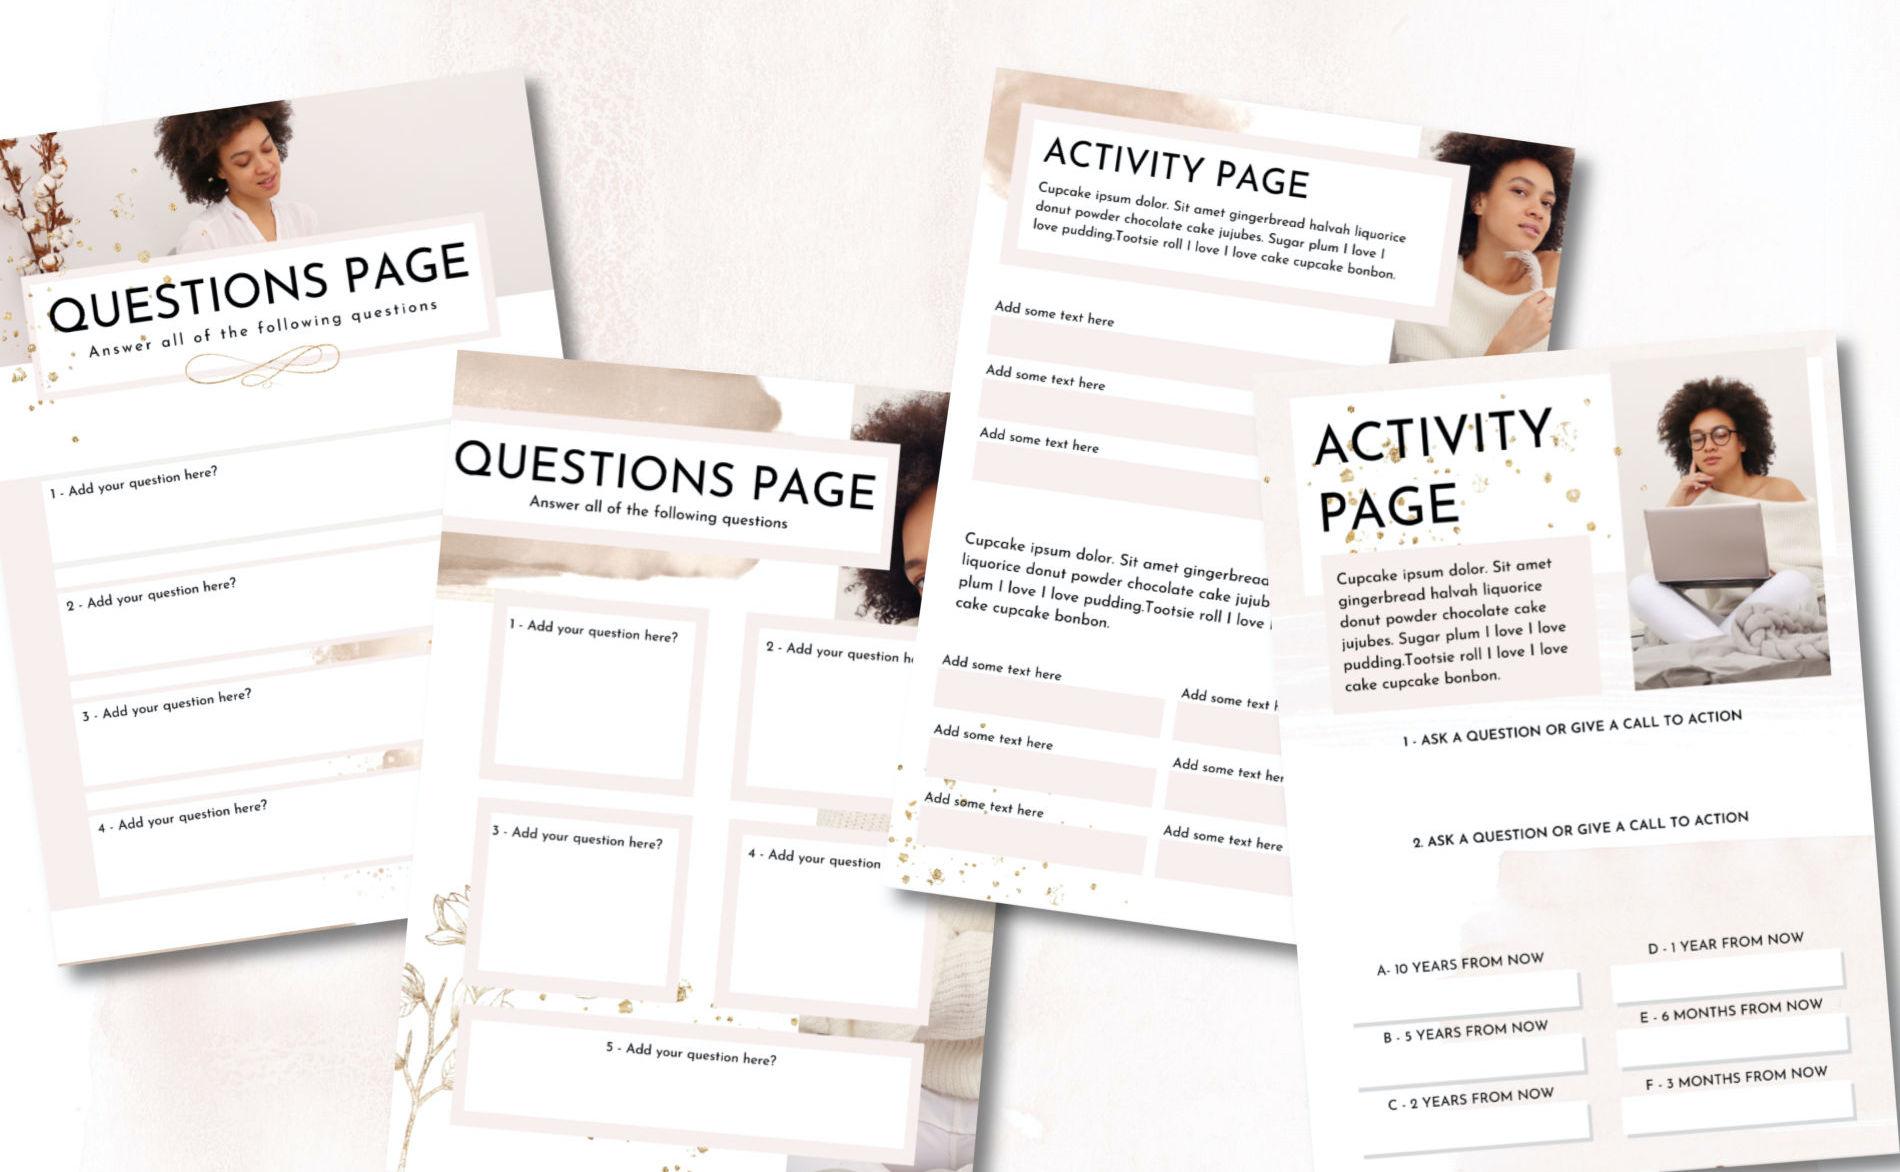 canva workbook templates for sale